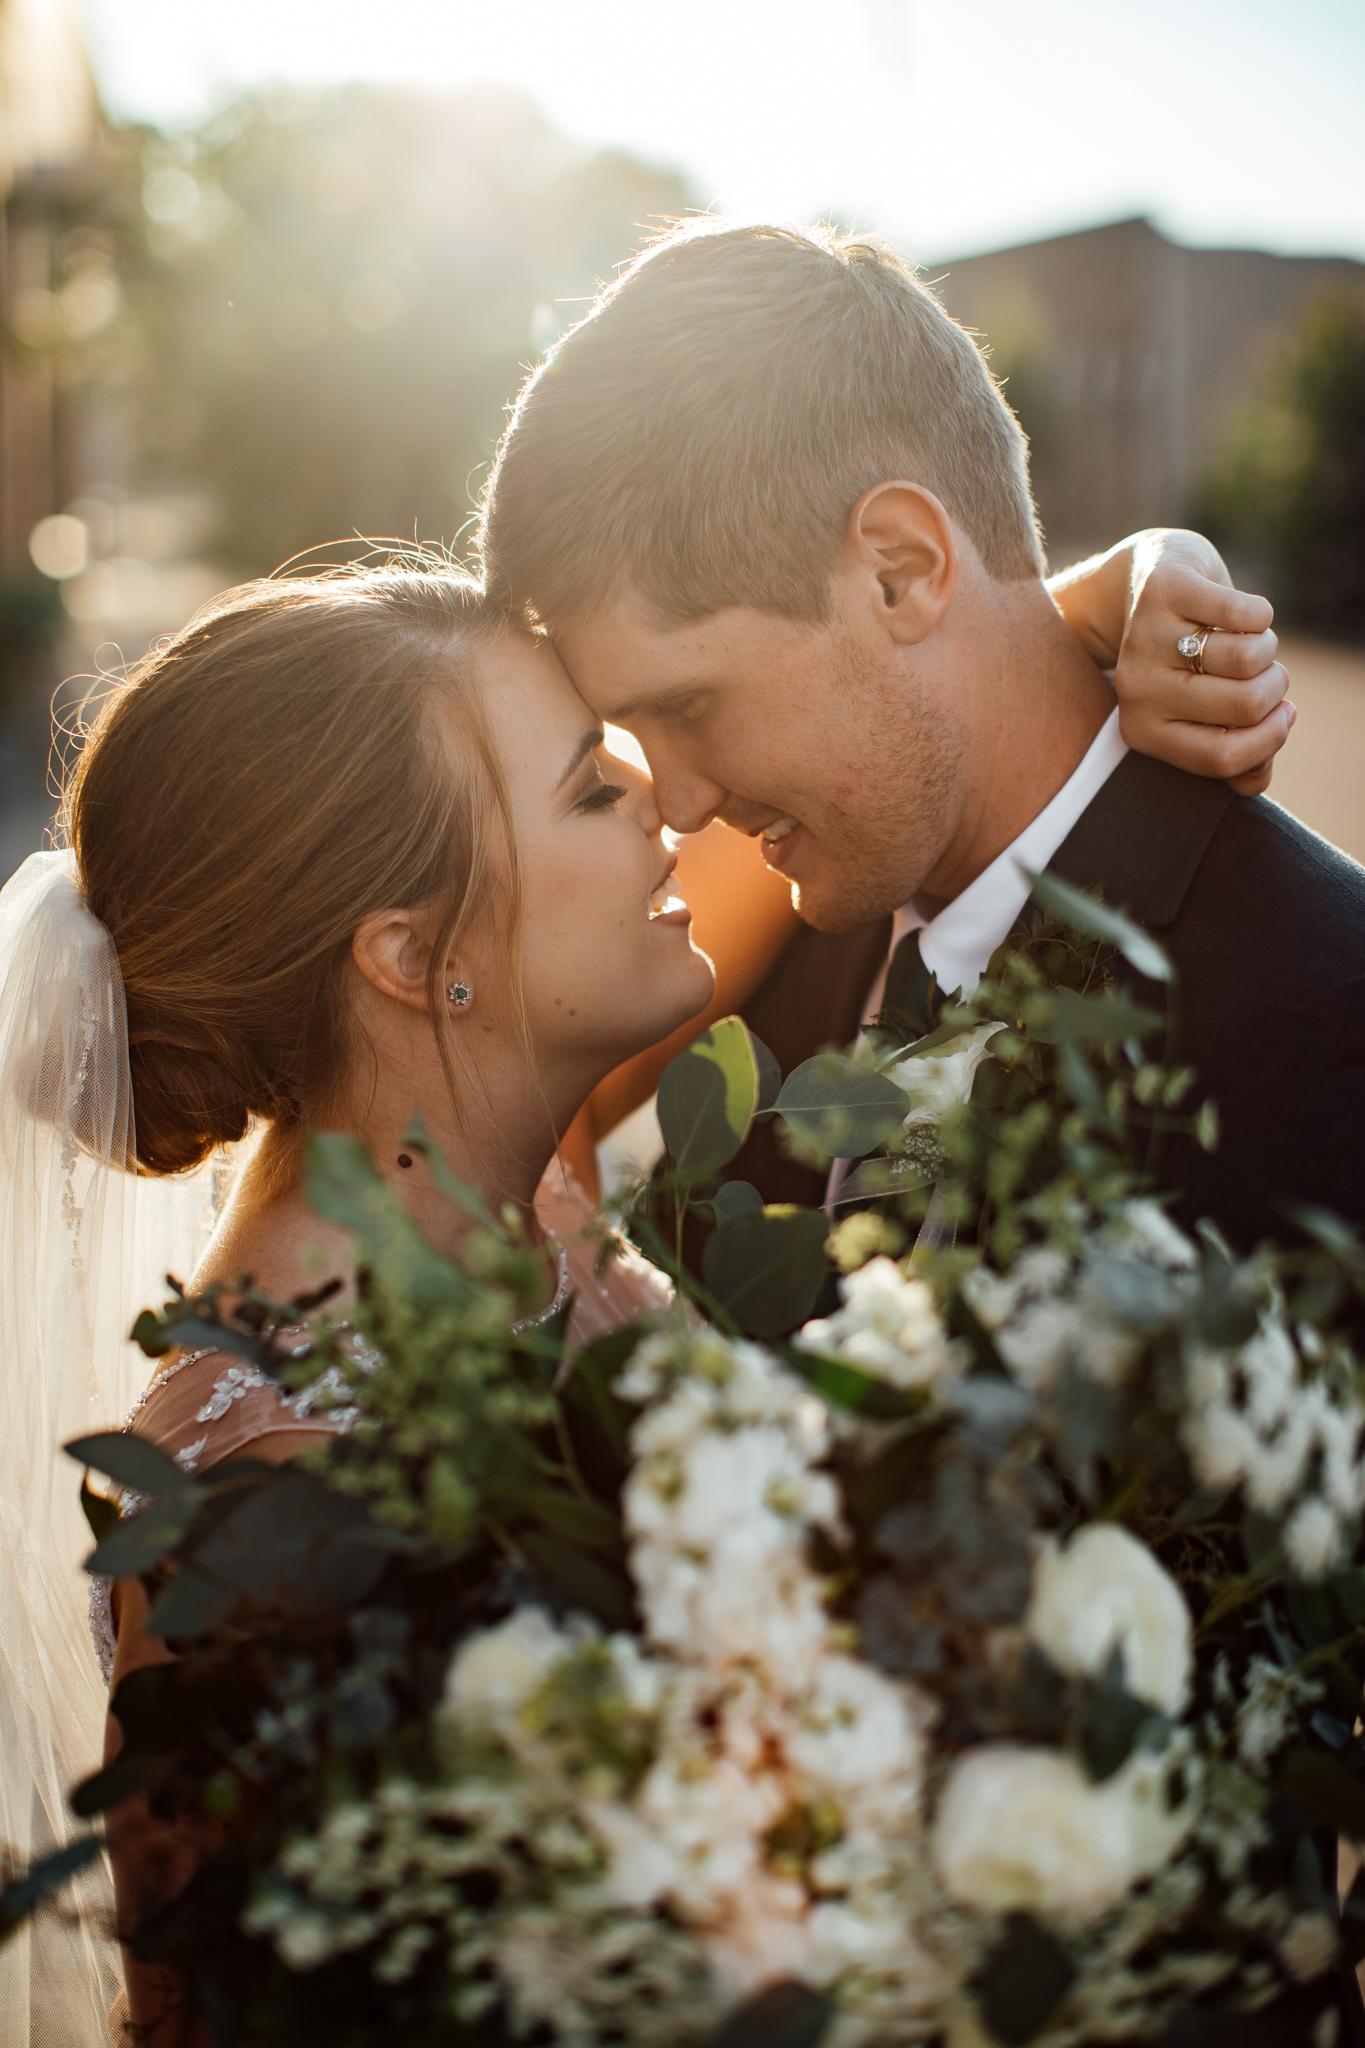 firstandgreen-grenada-ms-wedding-venue-thewarmtharoundyou-wedding-photographers (11 of 12).jpg